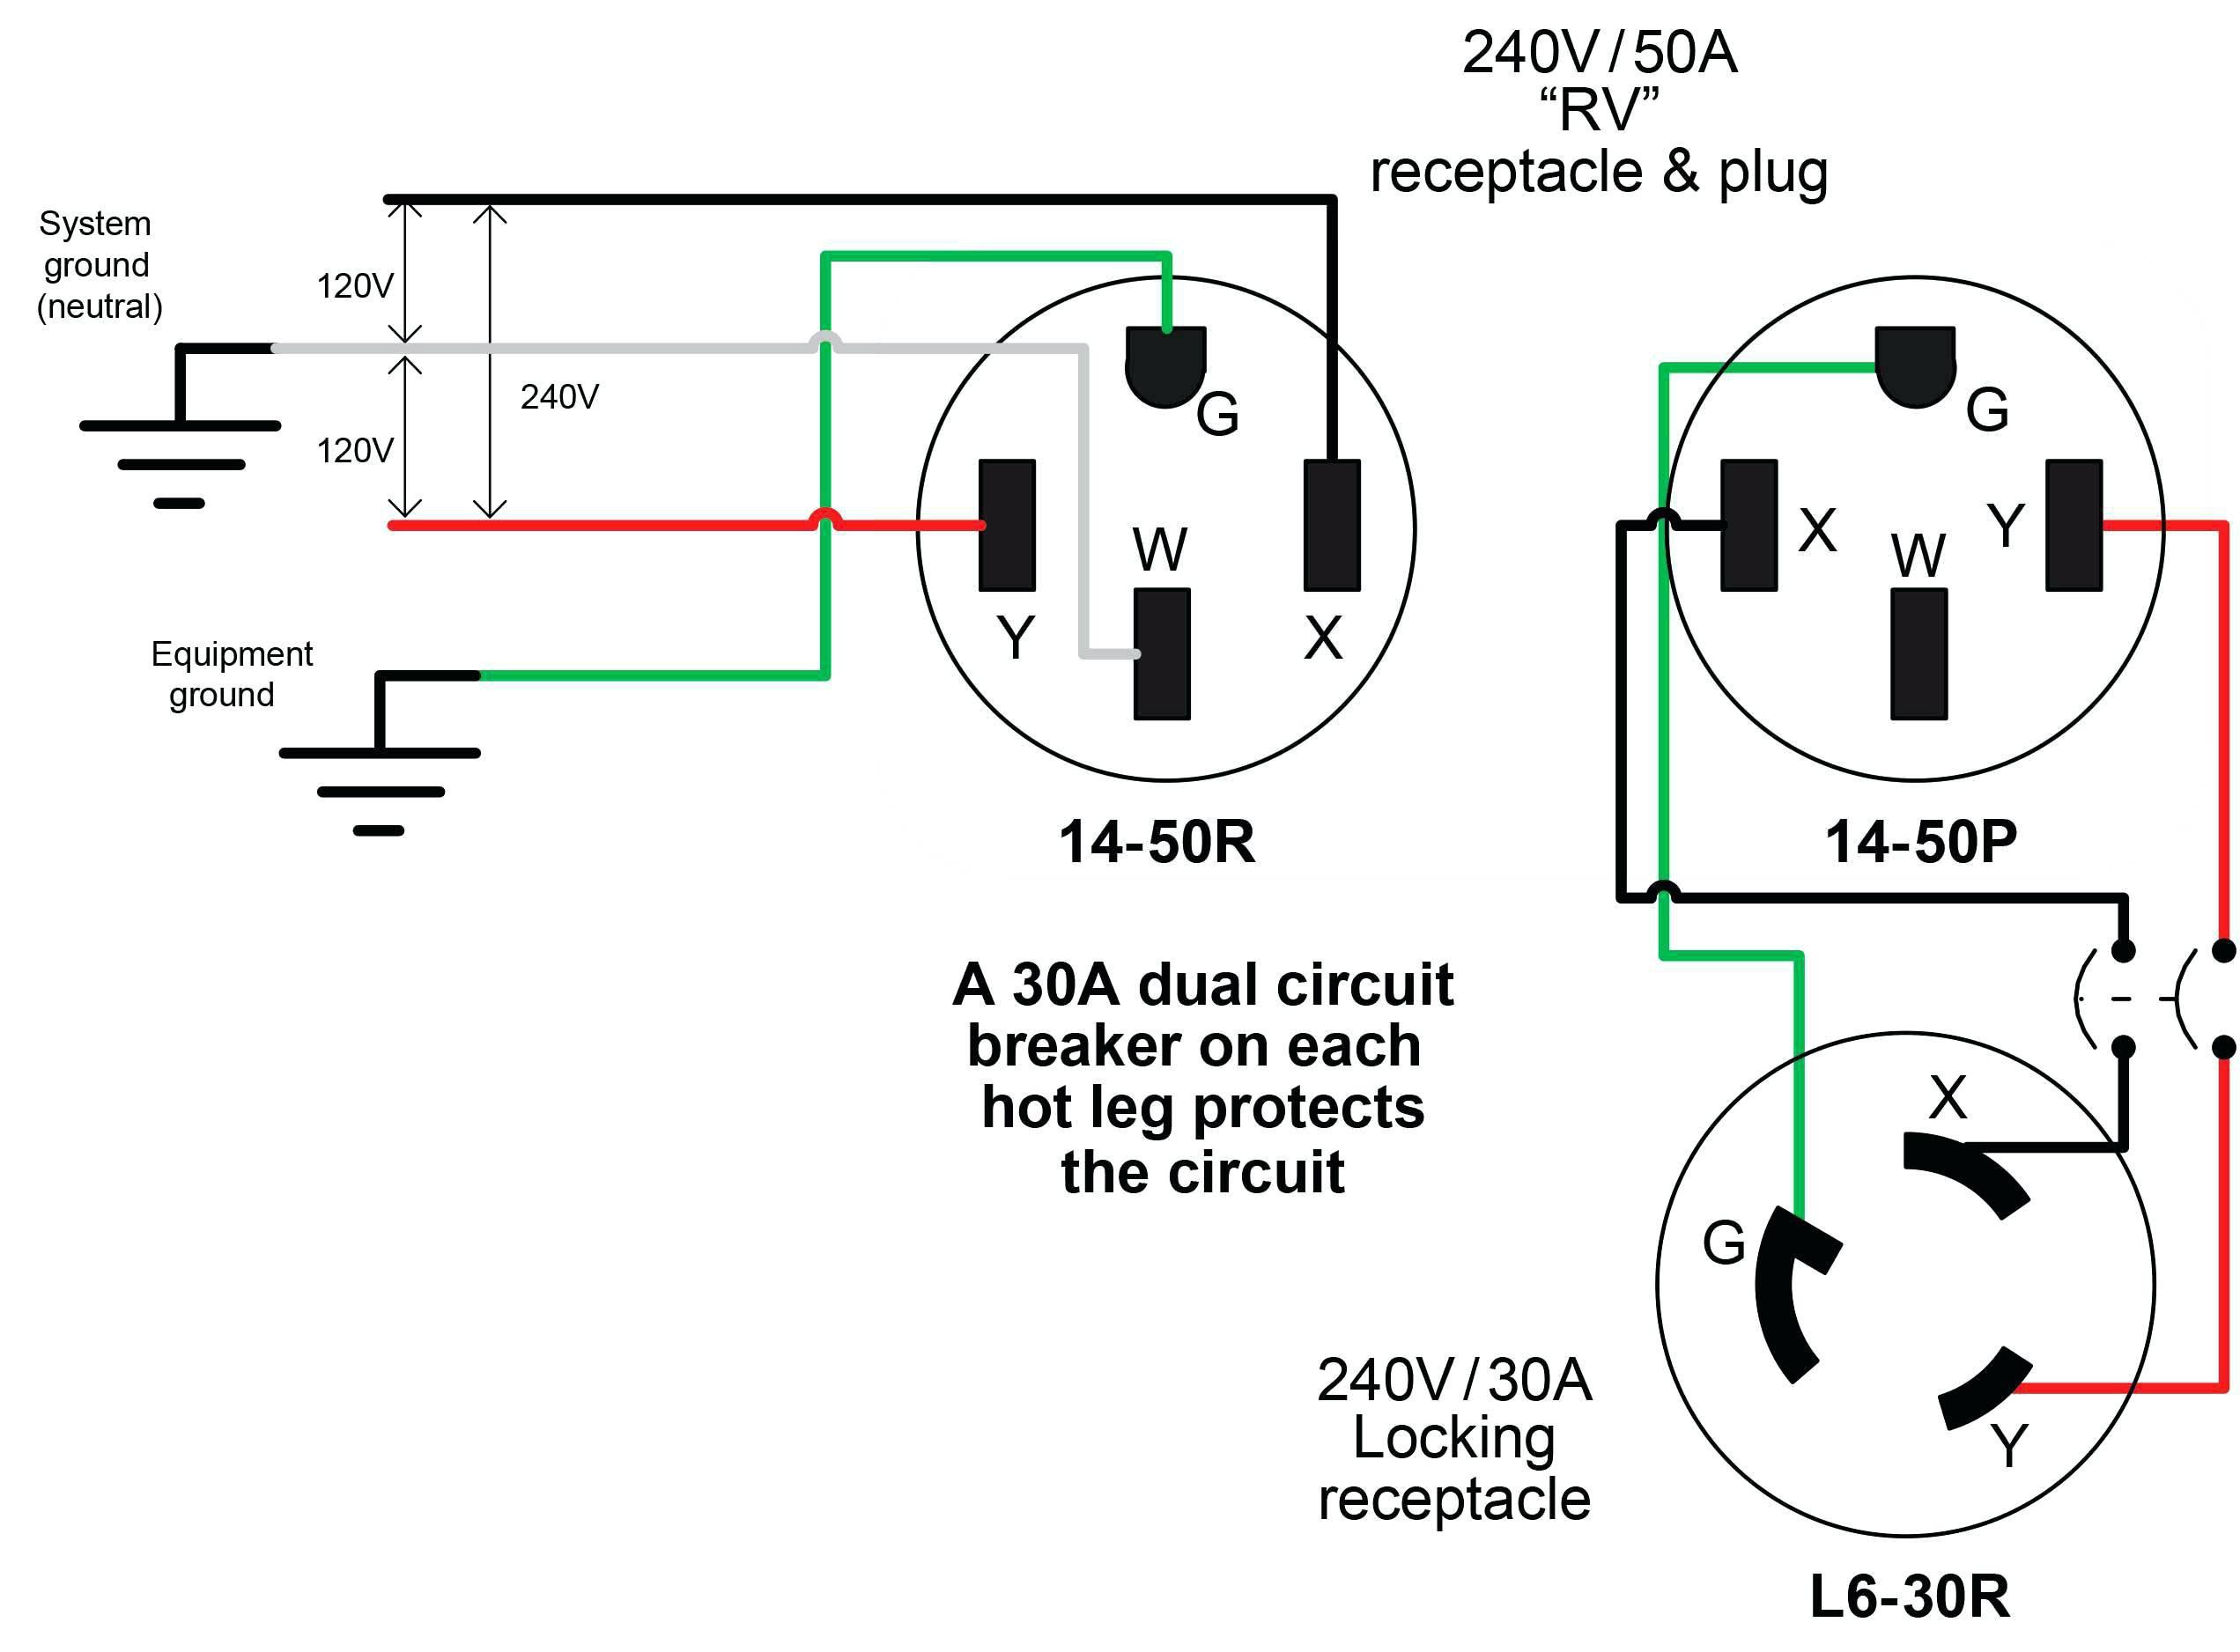 l6 30r wiring diagram Download-L14 30 Wiring Diagram Awesome A L1430 Plug Data Set E280a2 18-d